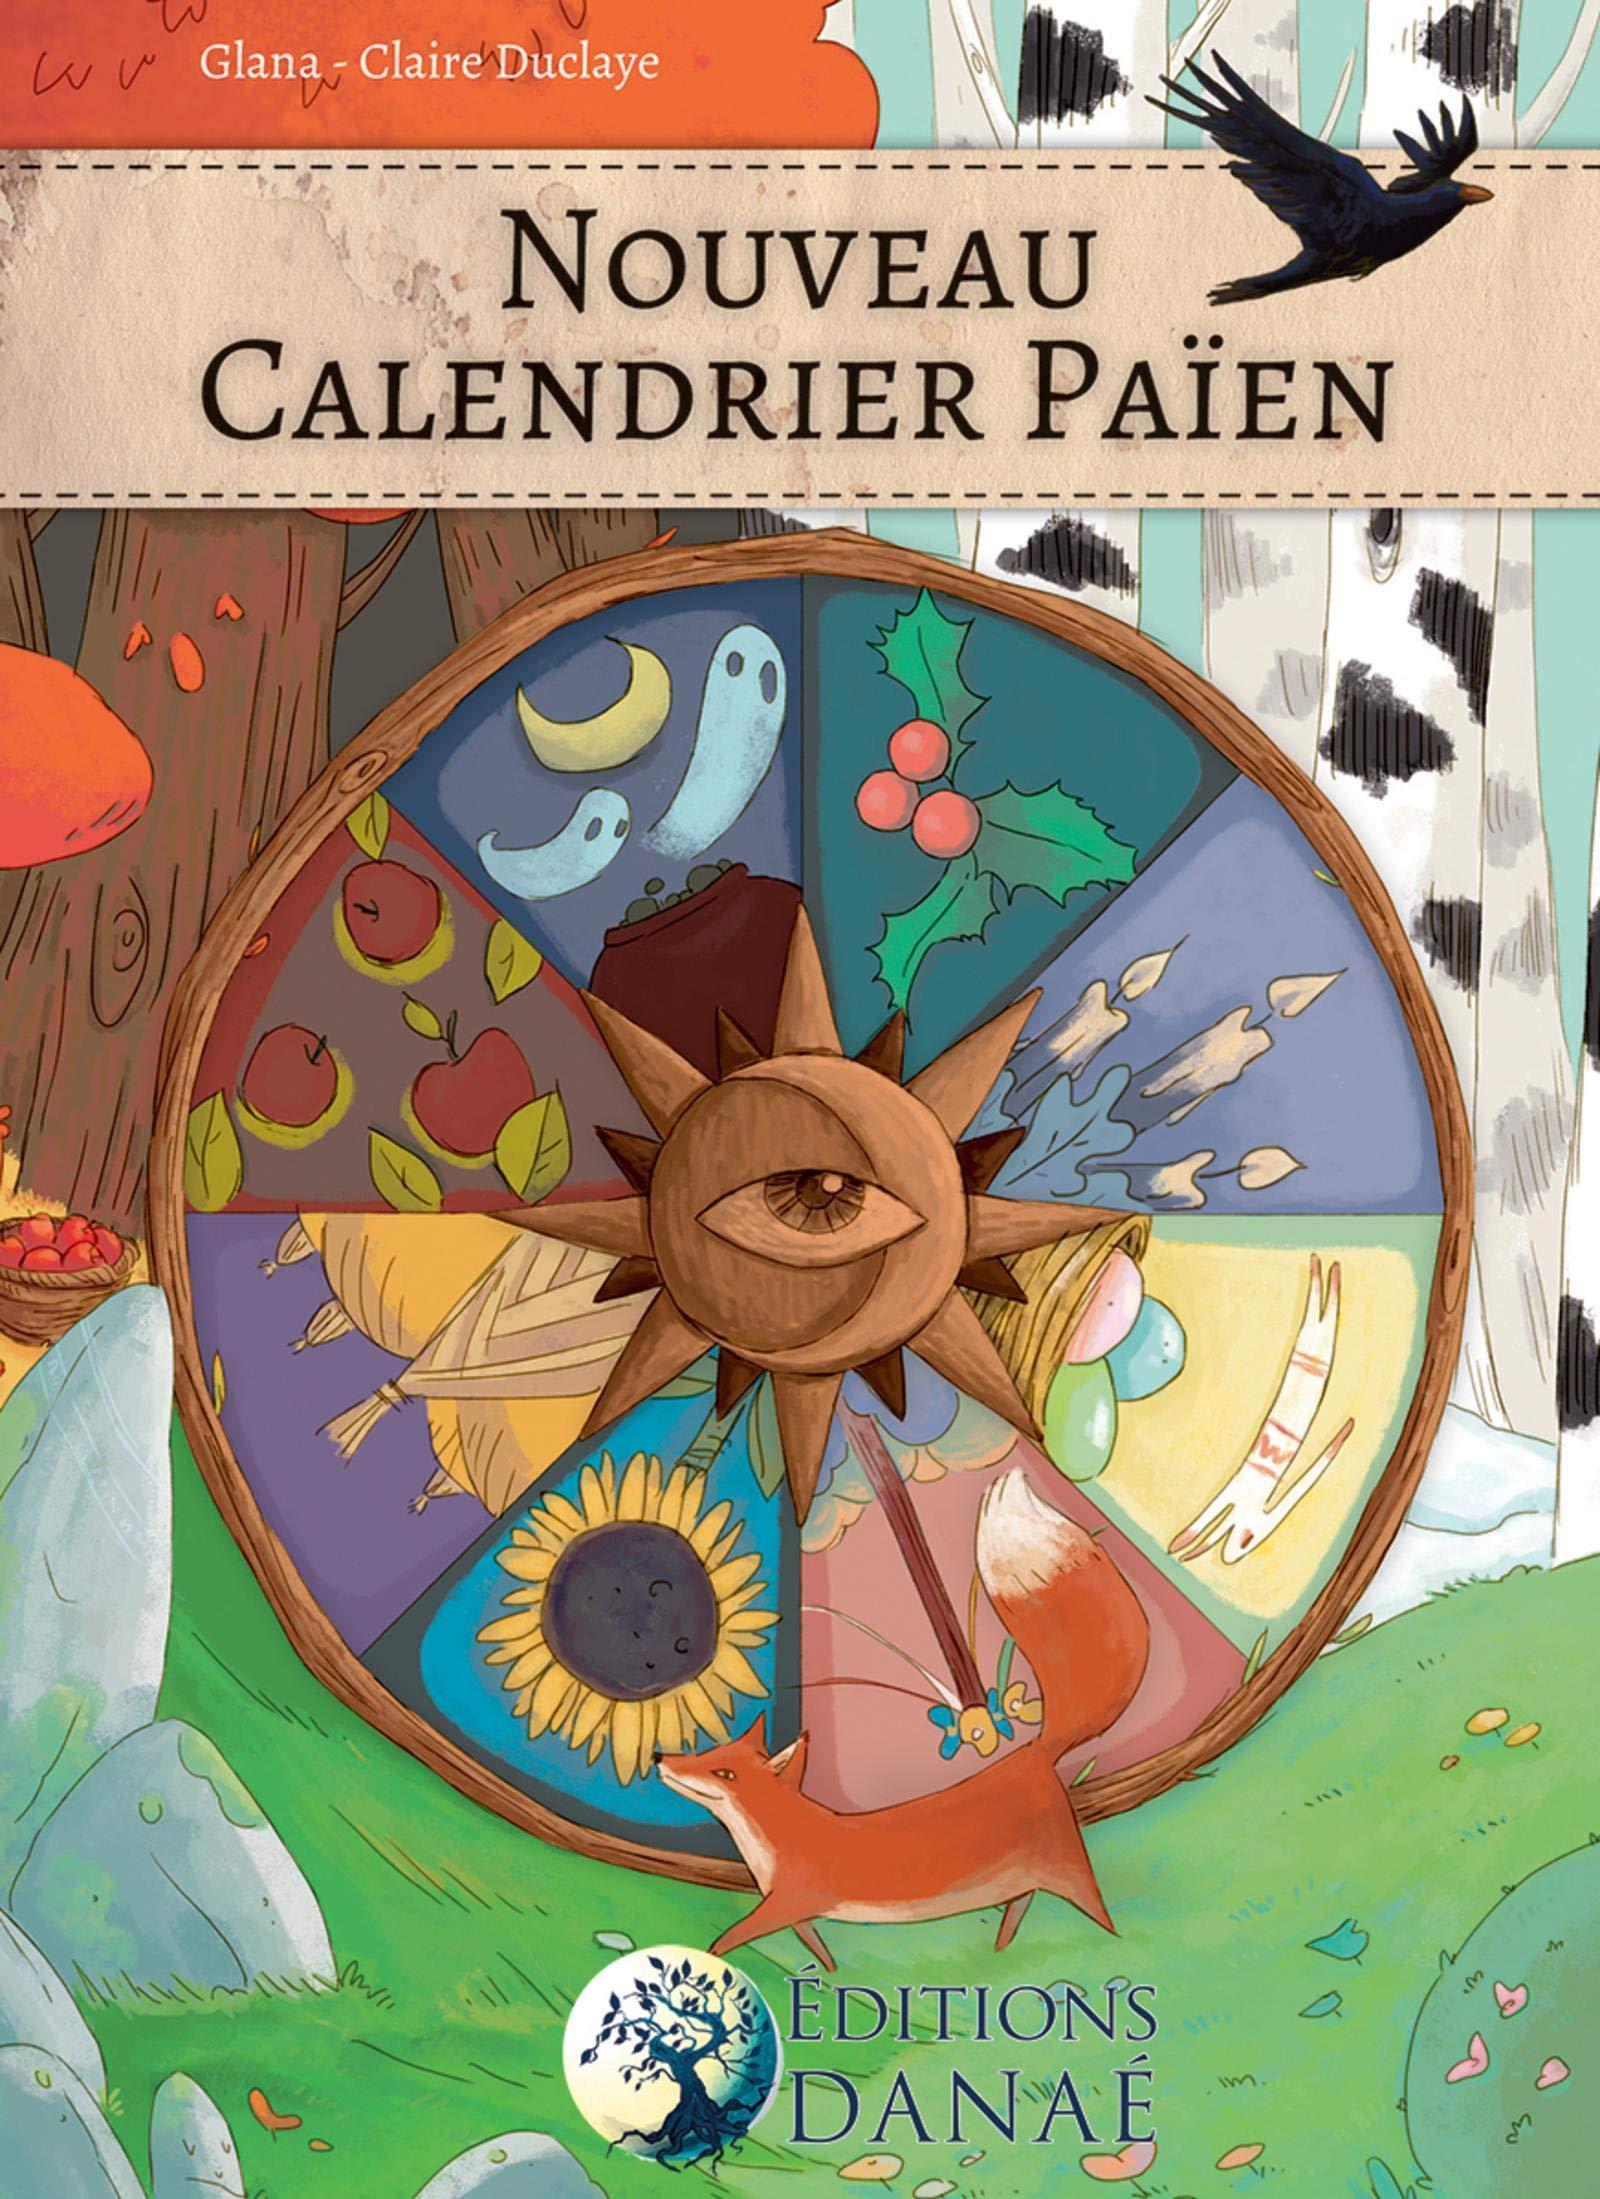 Nouveau Calendrier Païen (DANAE) (French Edition): Duclaye, Glana